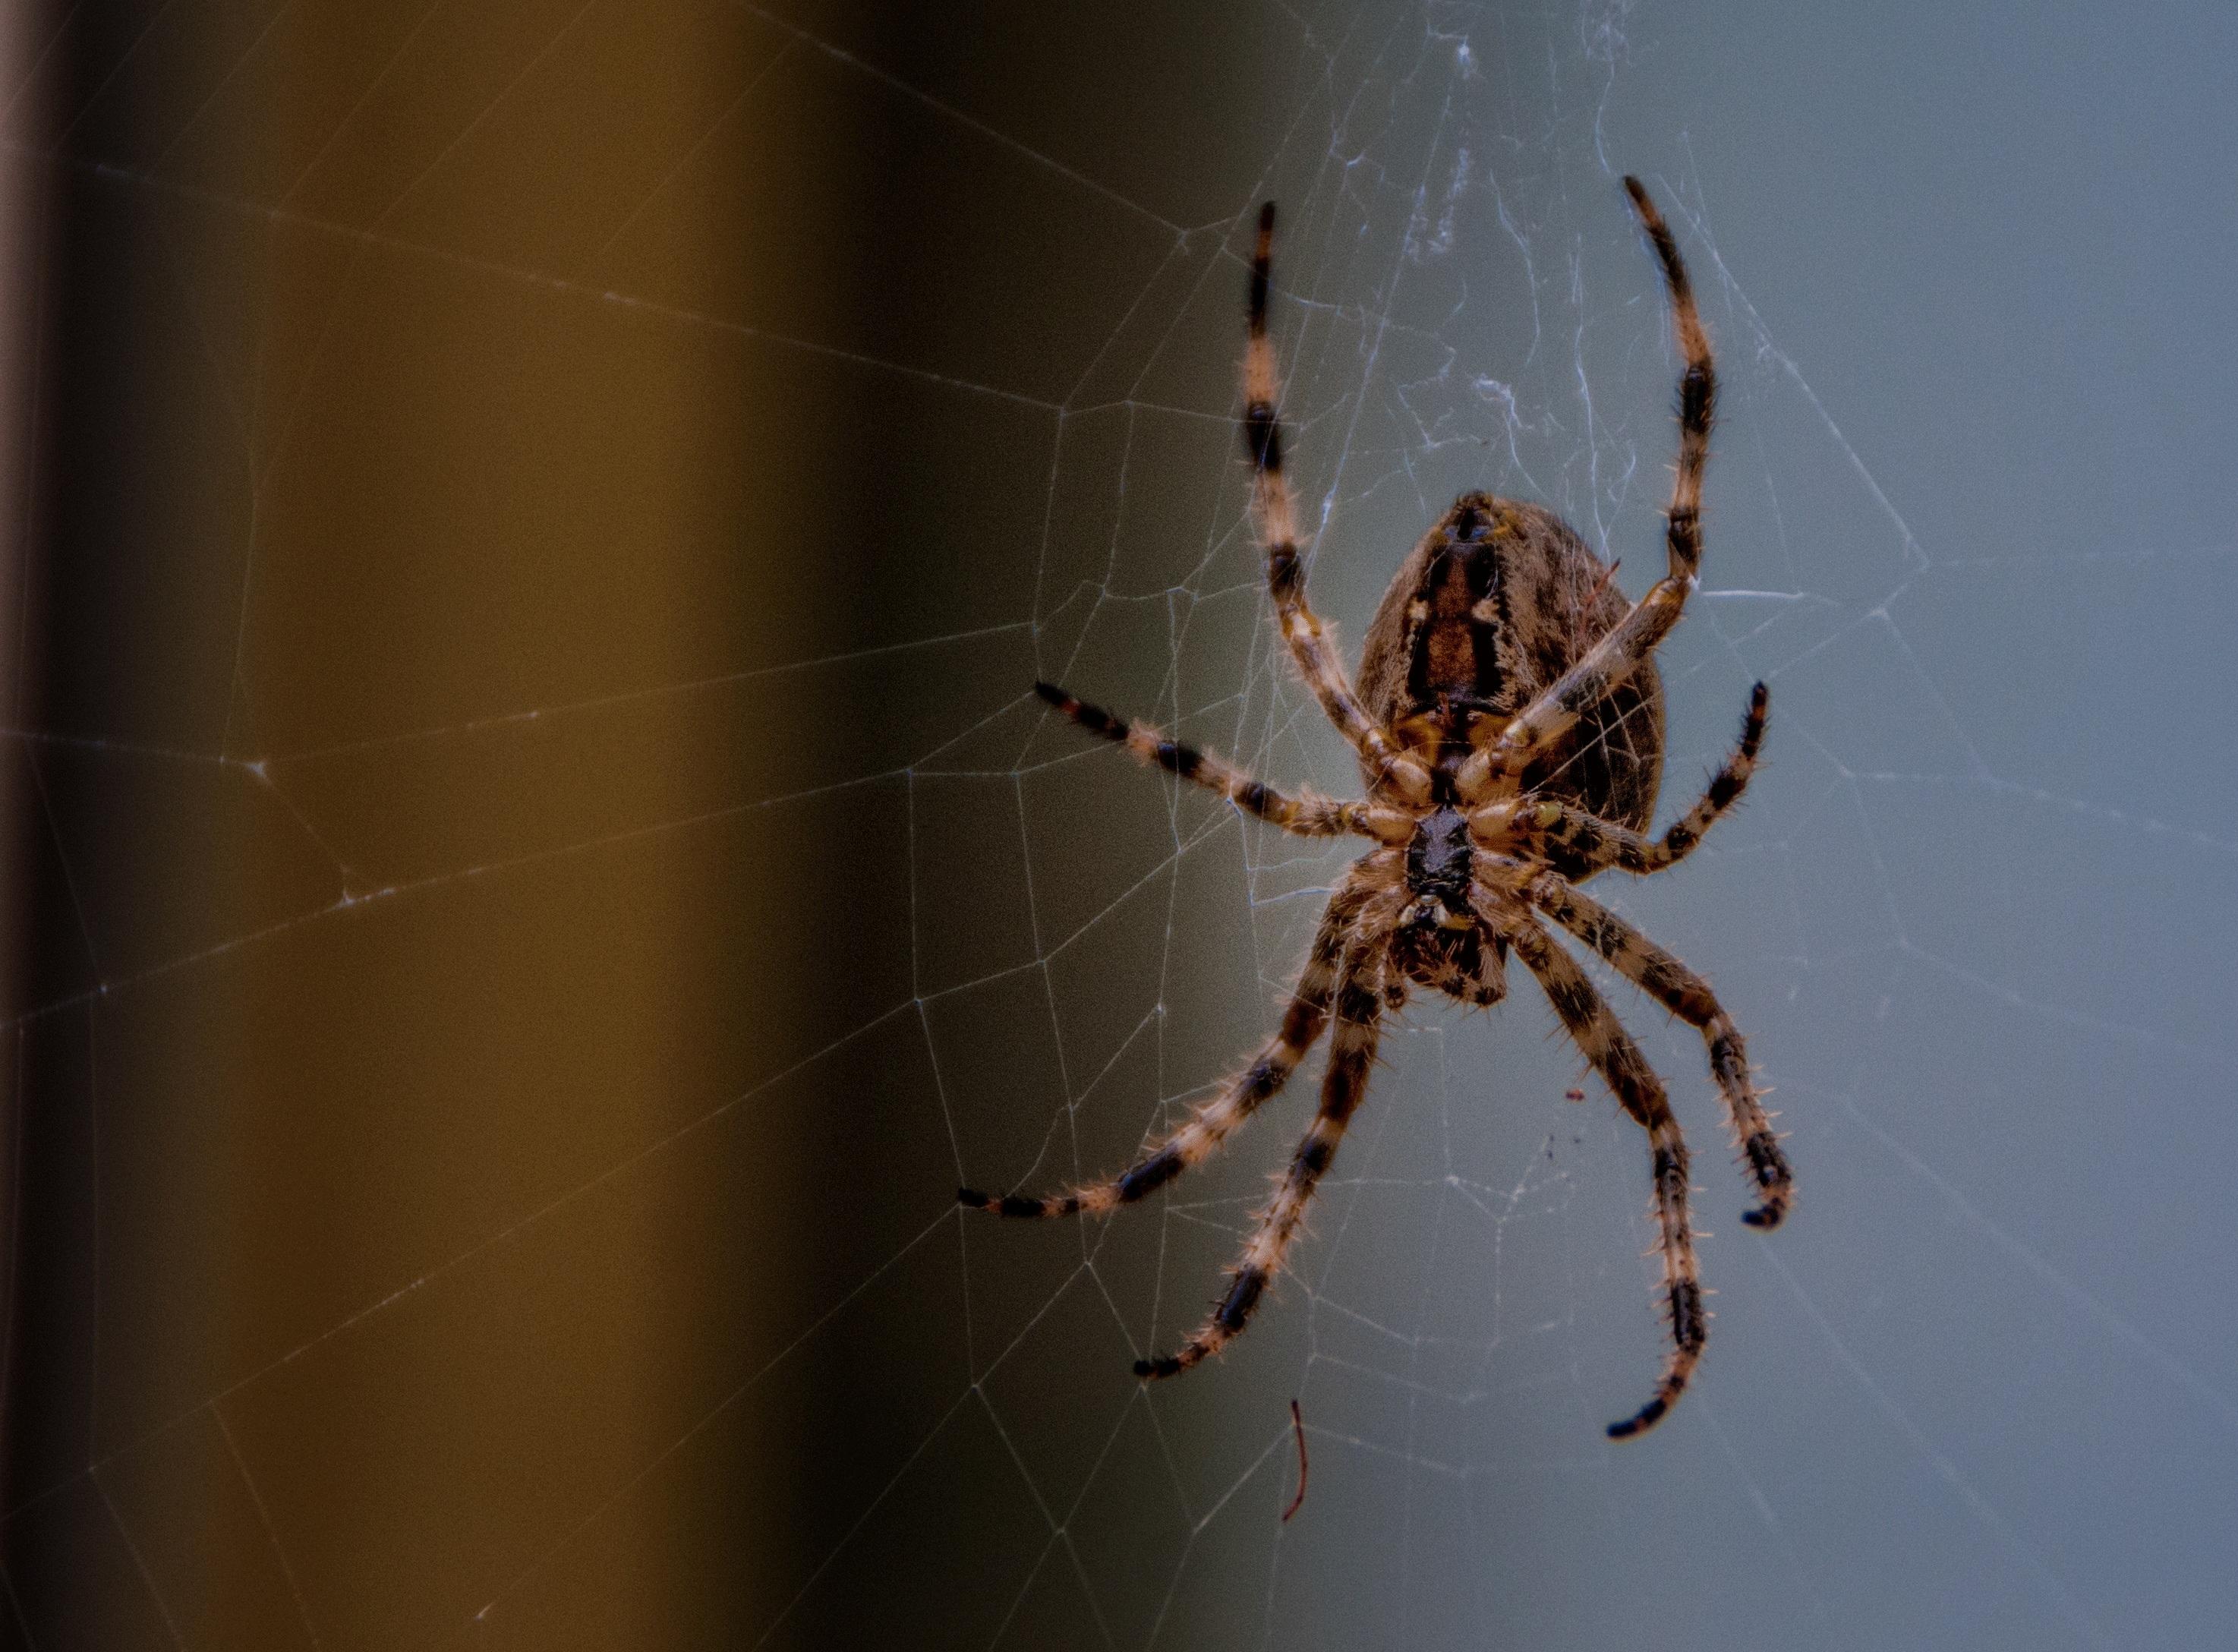 Free Images : nature, outdoor, bug, fauna, invertebrate, spider web ...